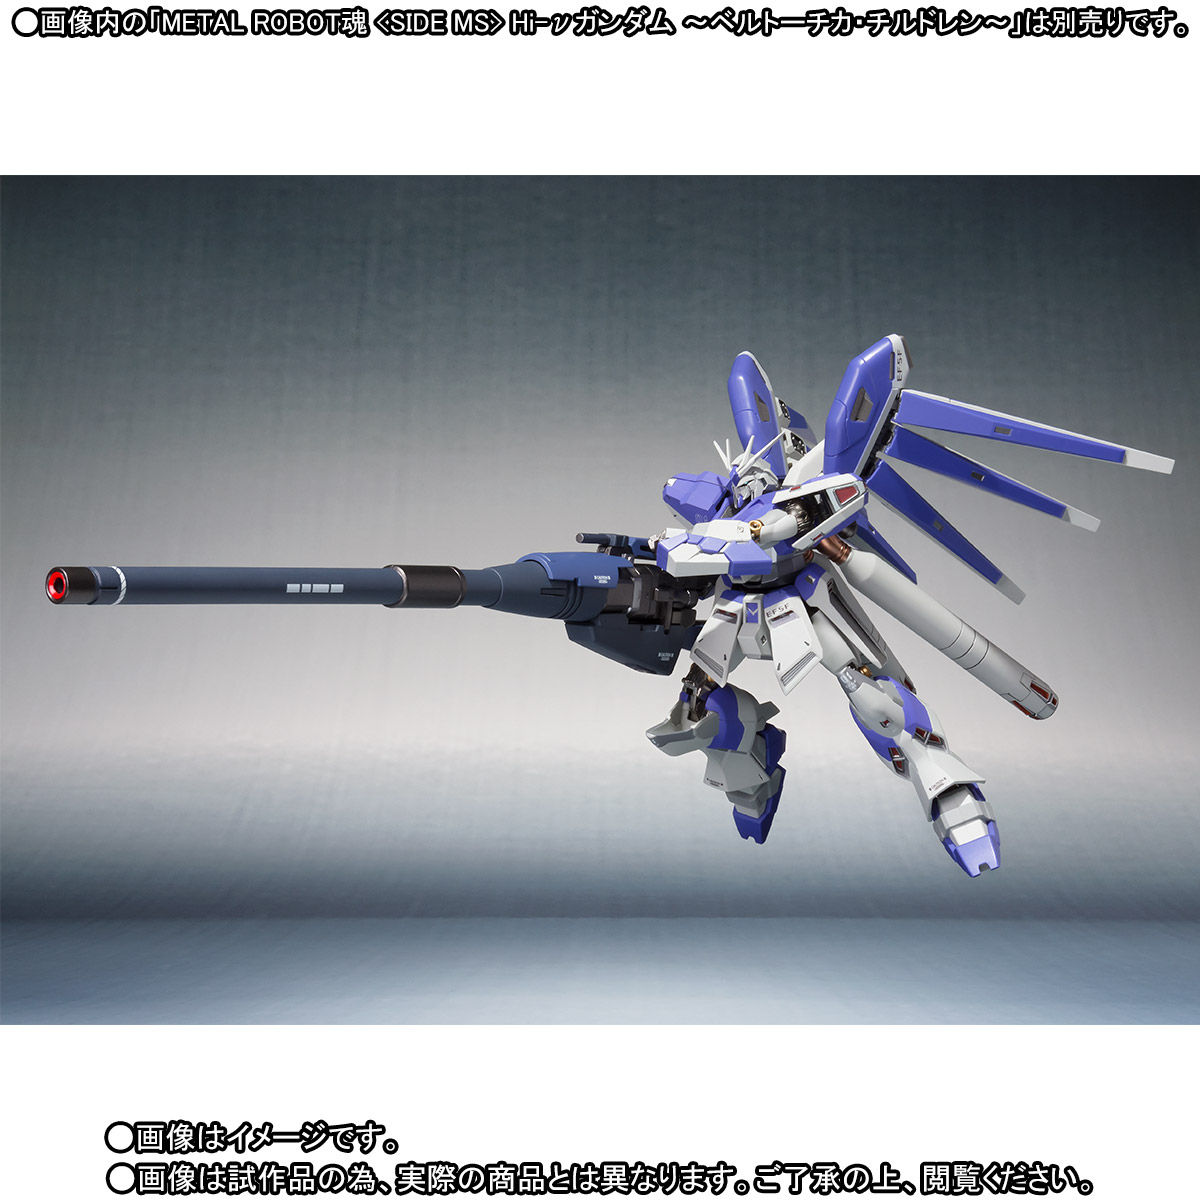 METAL ROBOT魂〈SIDE MS〉『Hi-νガンダム専用ハイパー・メガ・バズーカ・ランチャー』パーツセット-002